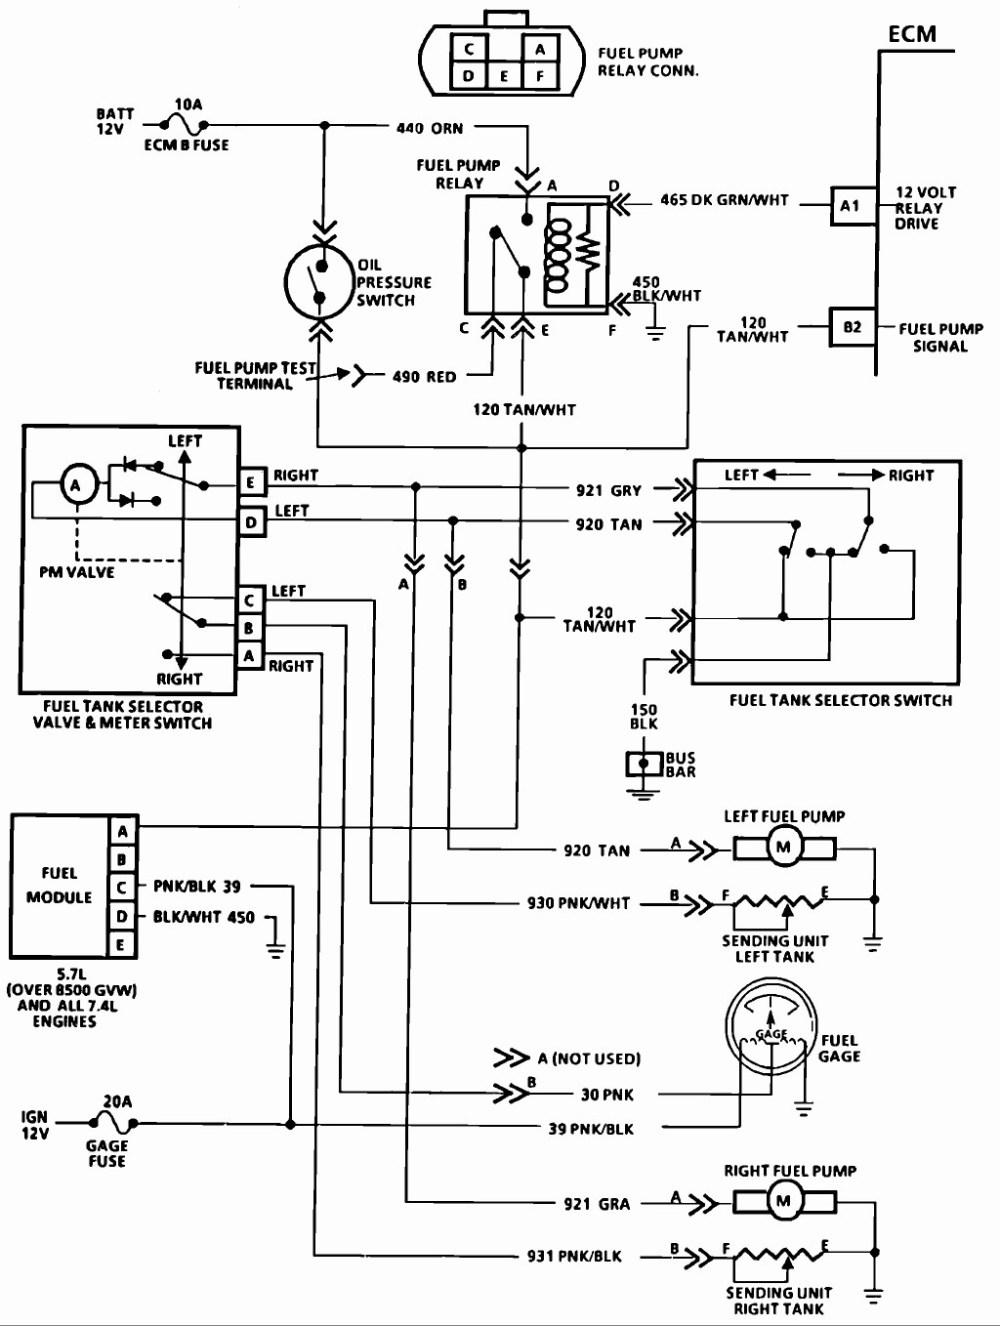 medium resolution of chevy truck fuel pump wiring wiring diagrams wni wiring diagram 1995 k1500 fuel pump relay